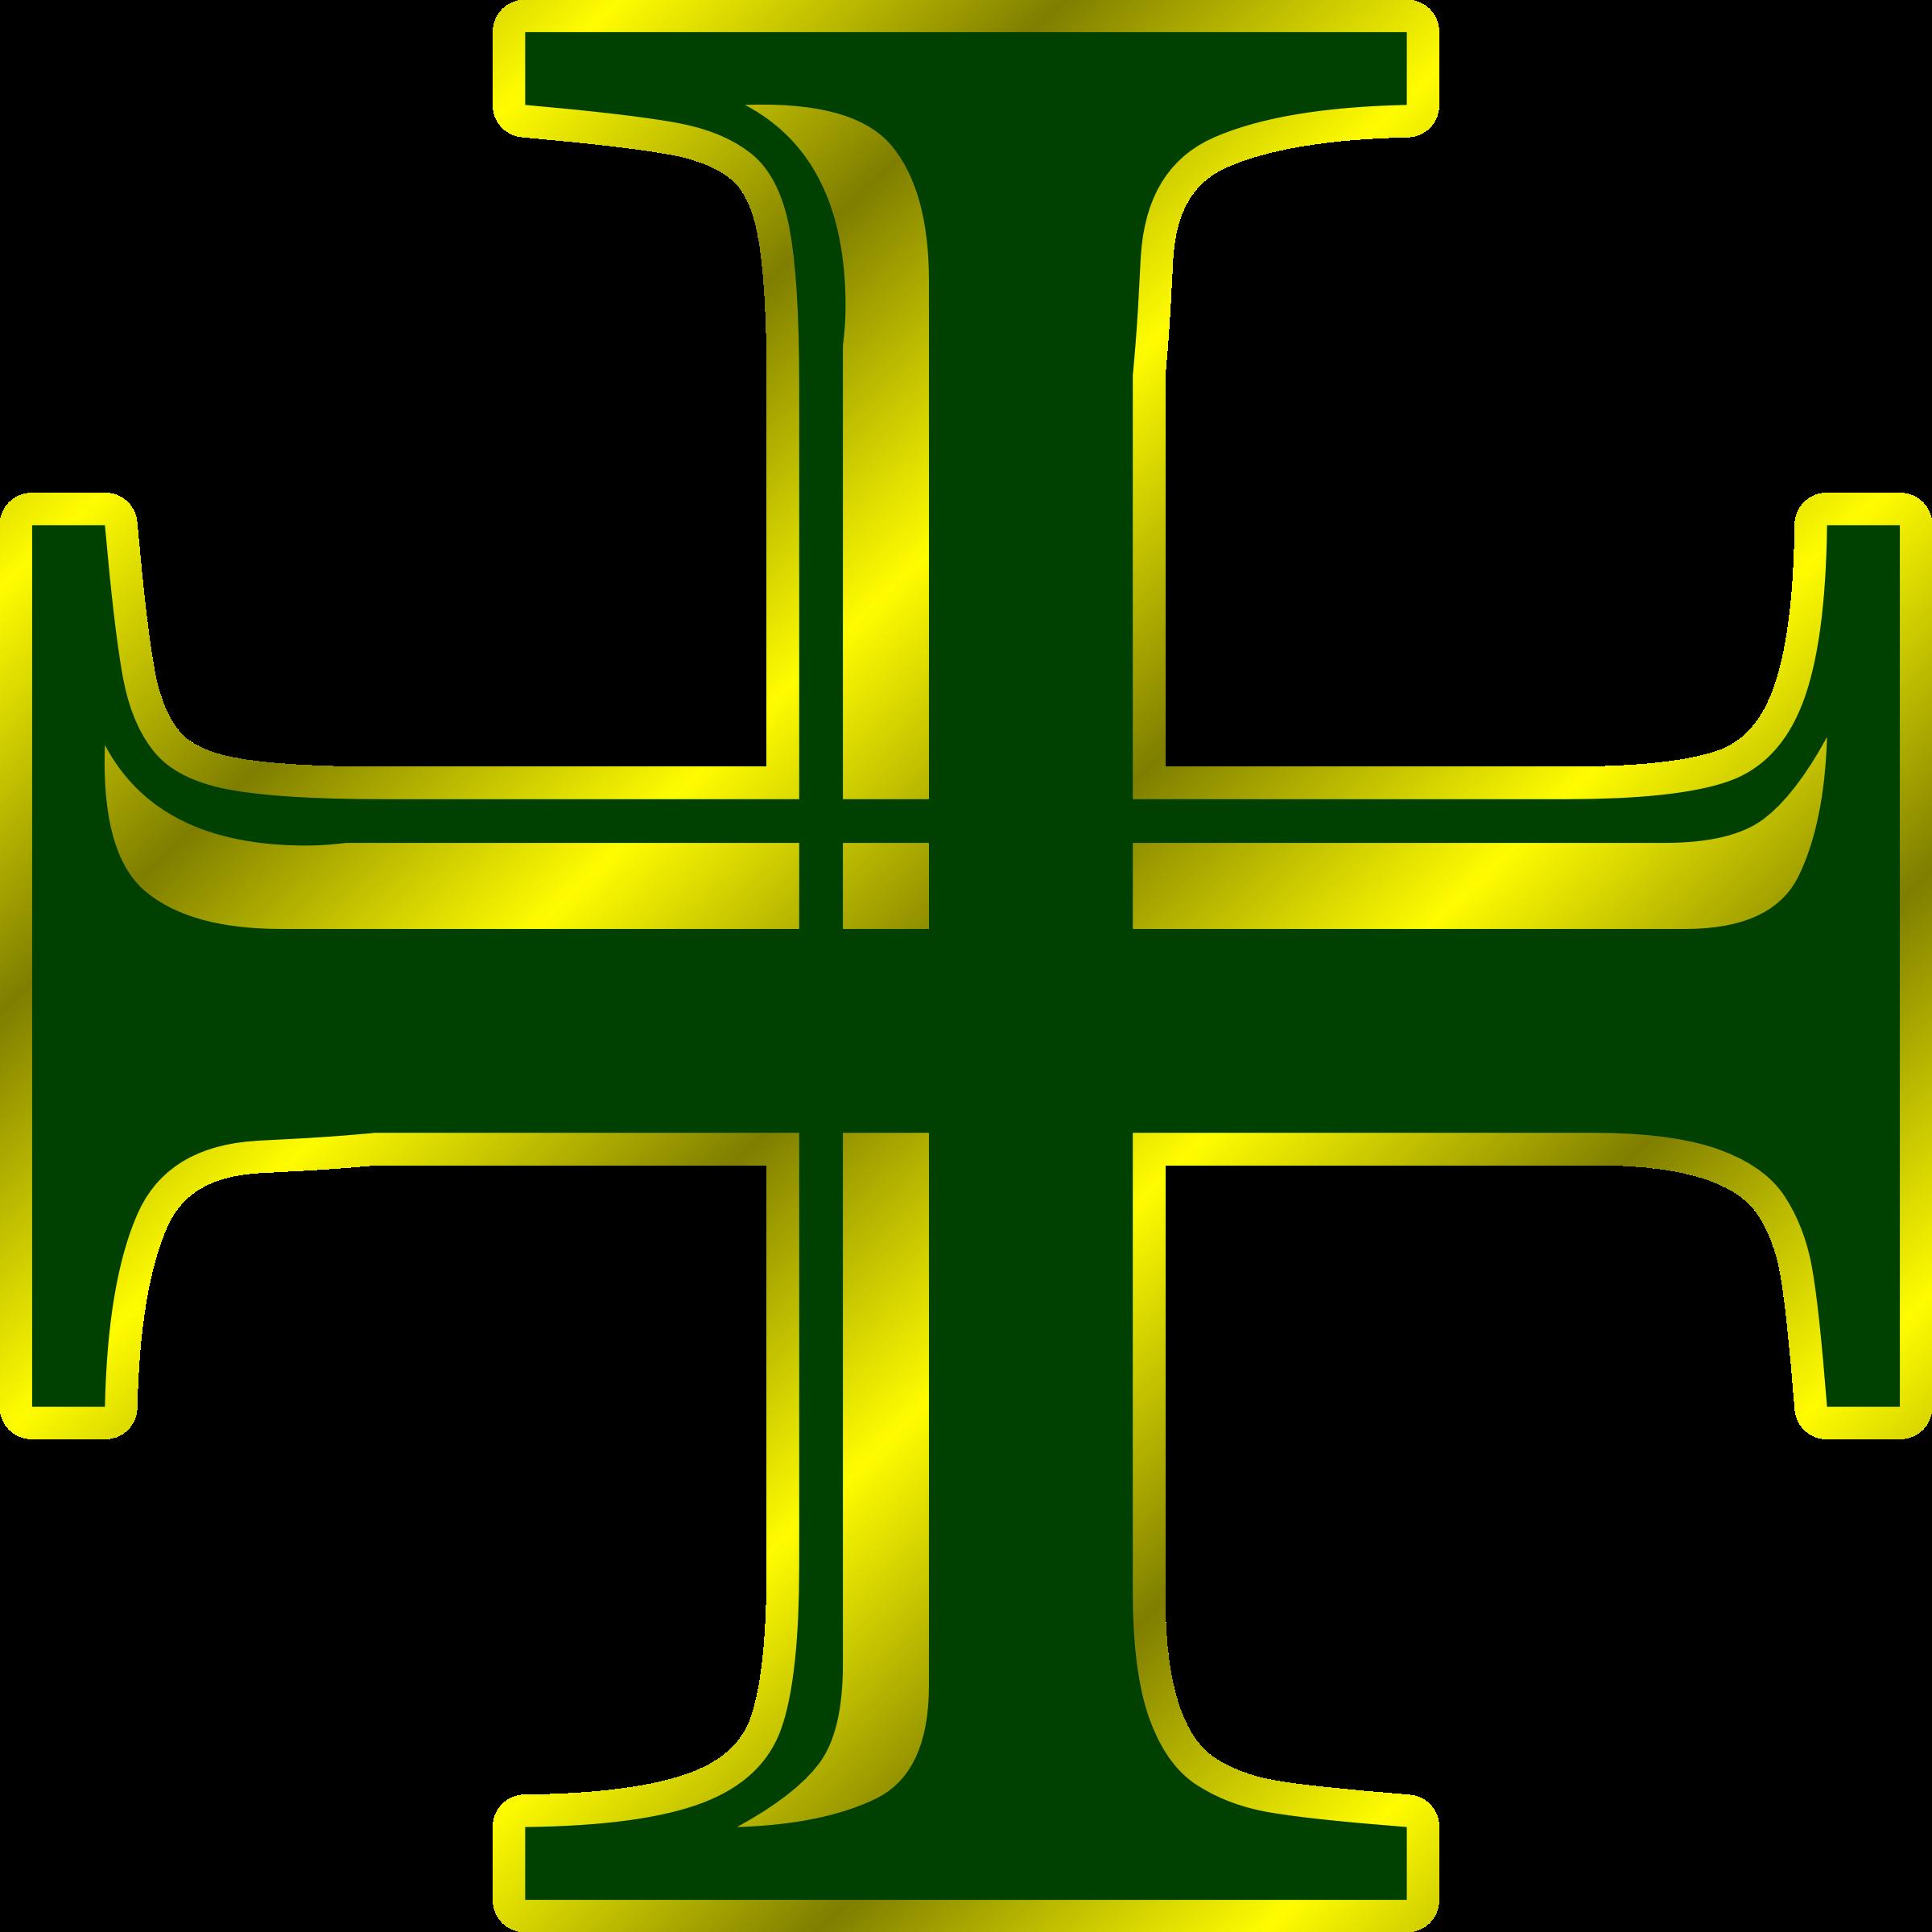 Cross love clipart banner freeuse stock Clipart - Green and Gold Cross banner freeuse stock